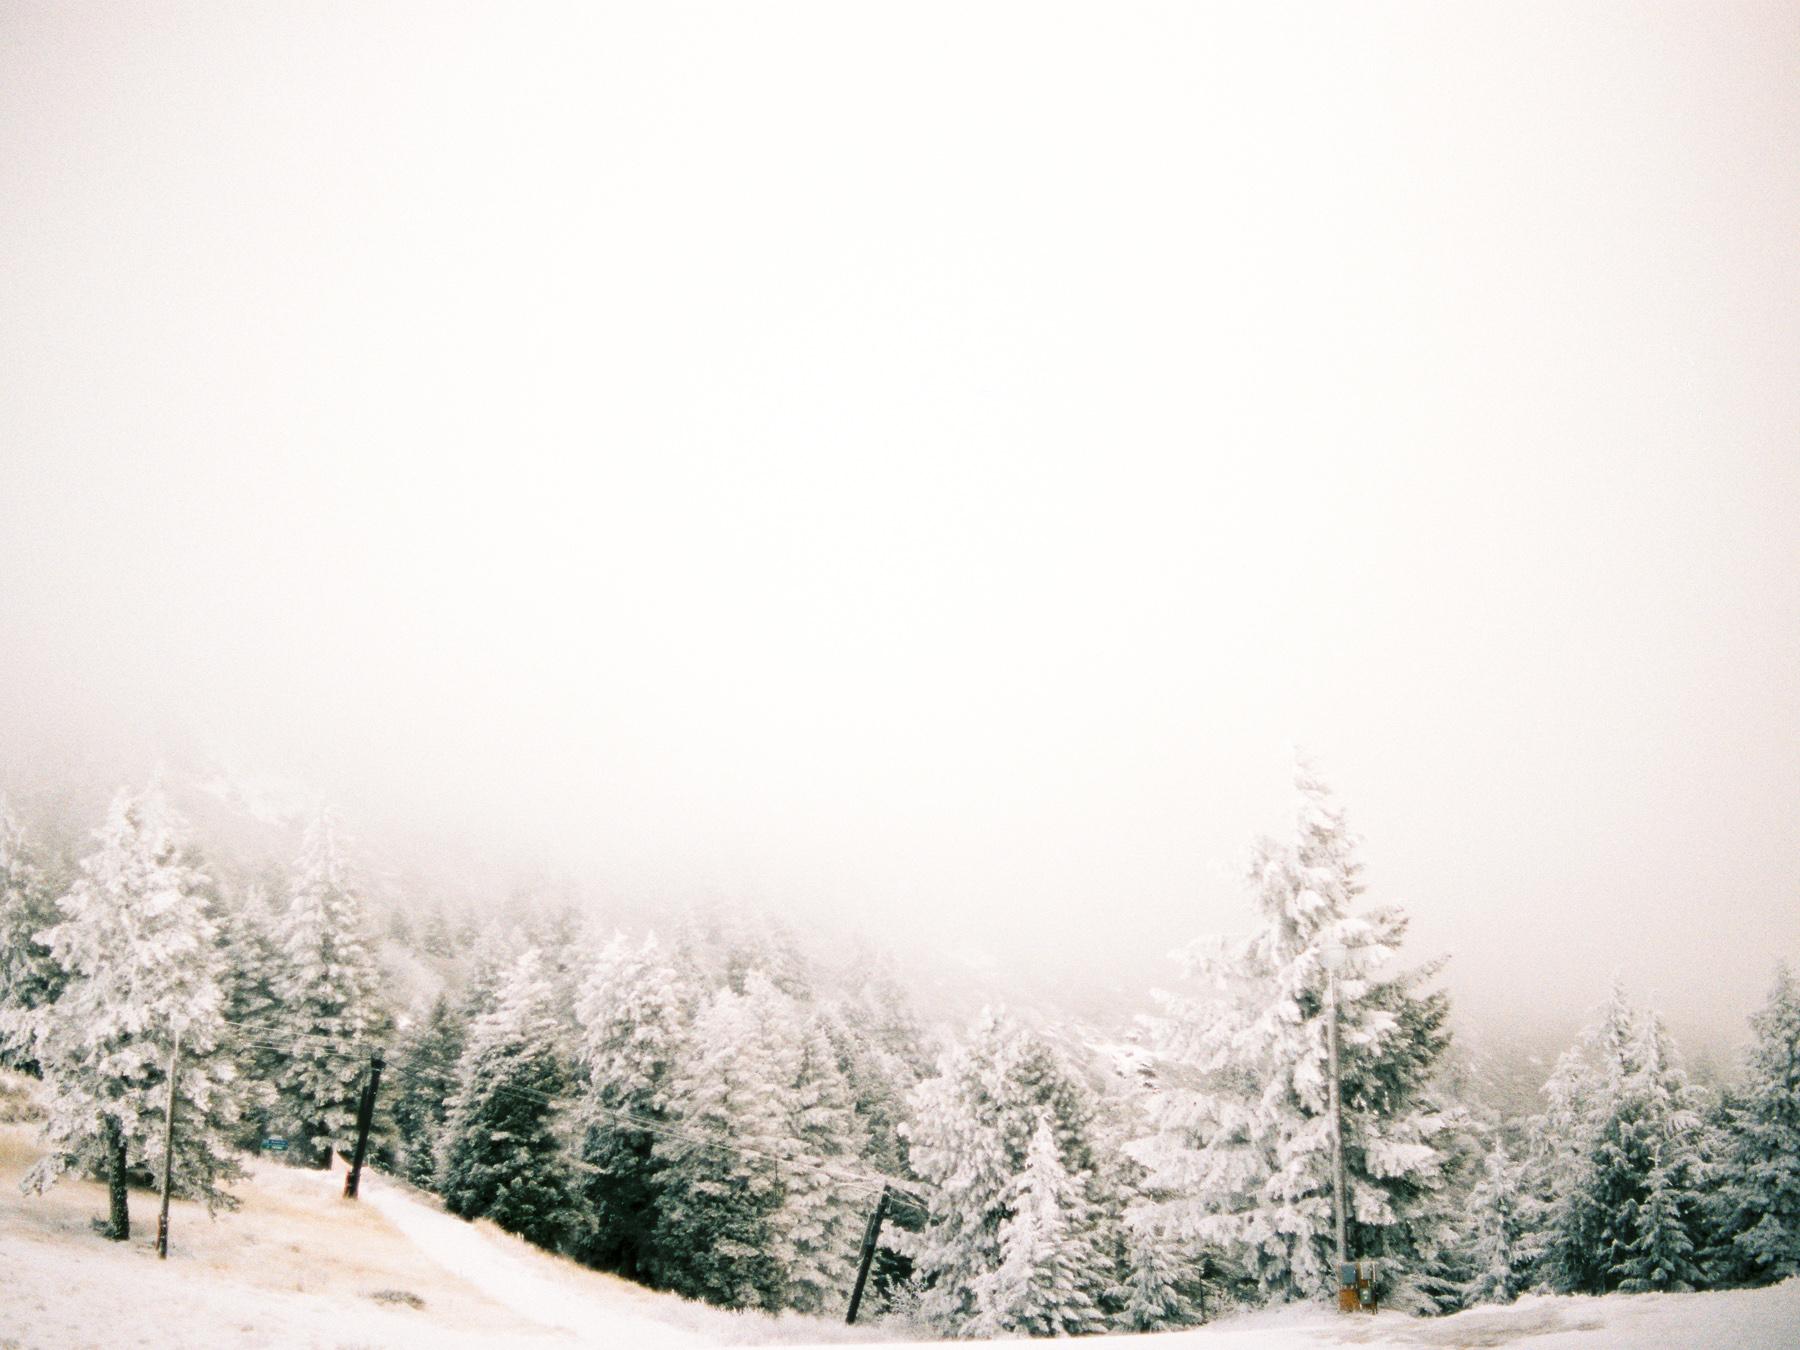 Ben+Joella | Winter on Film 15.jpg